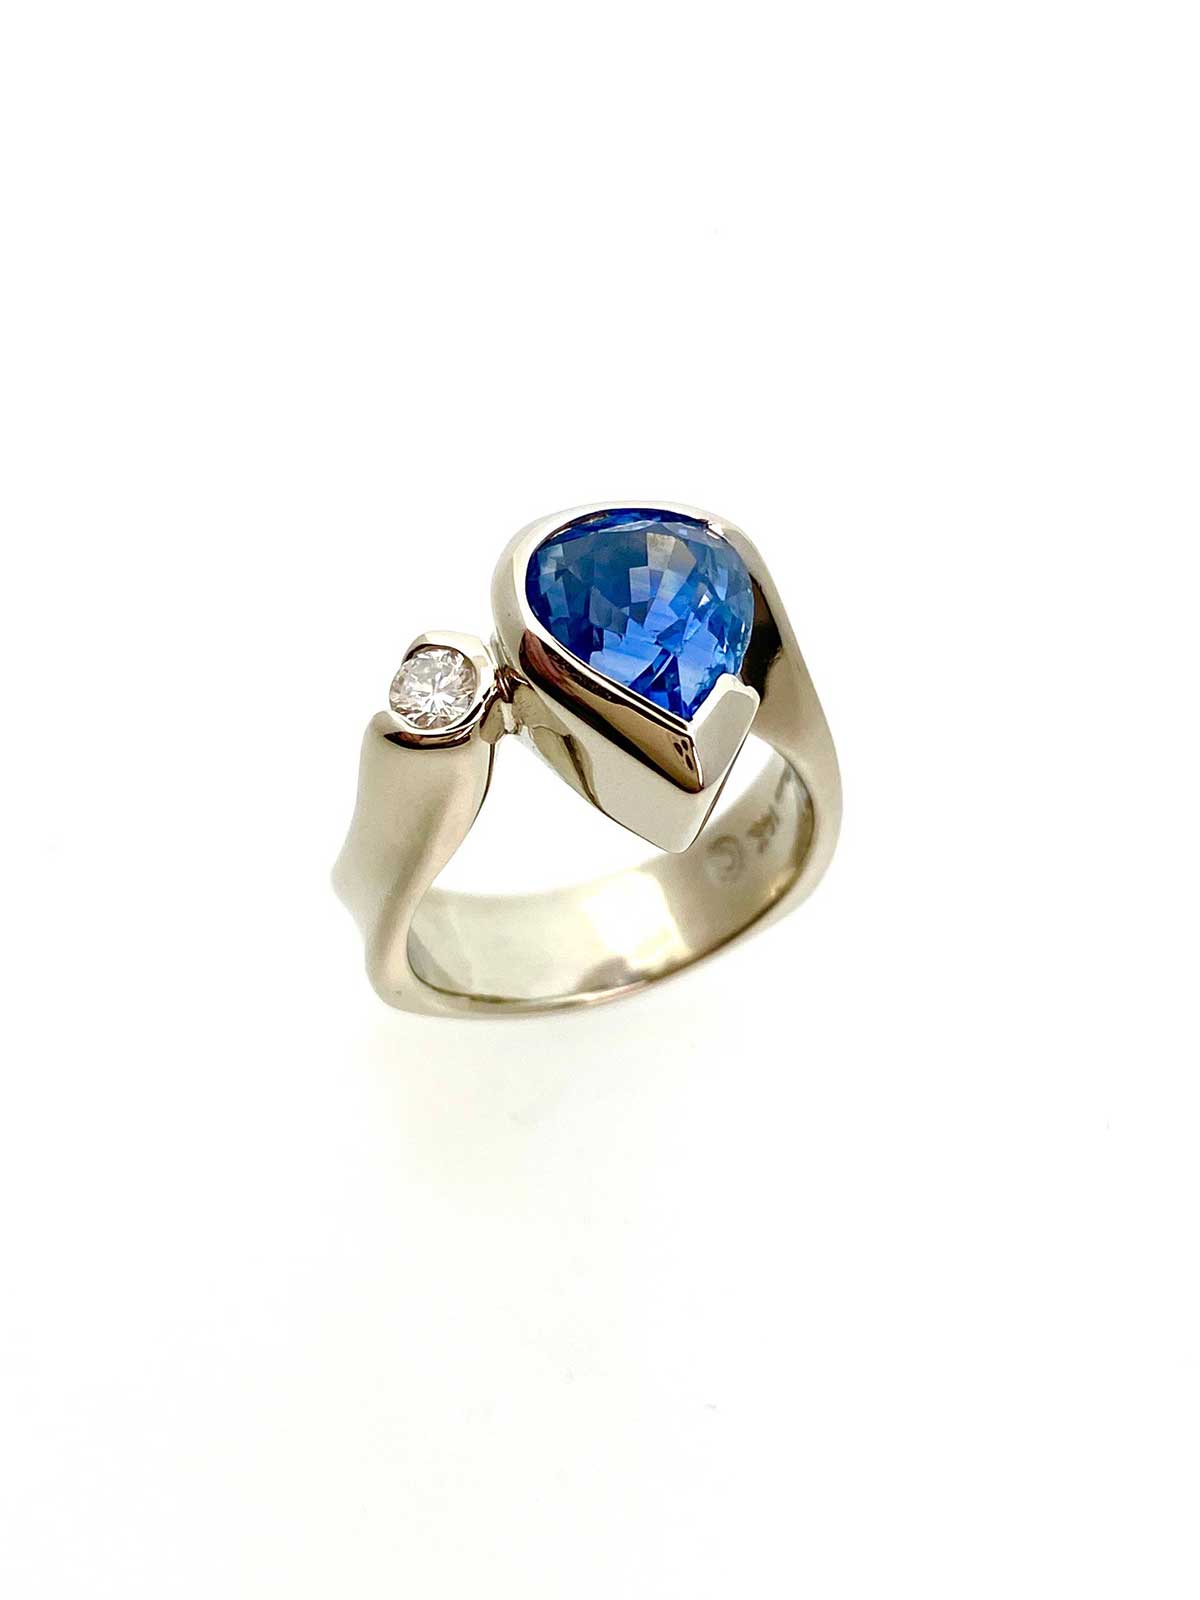 Yellow gold, pear shaped sapphire, diamond ring custom designed for customer